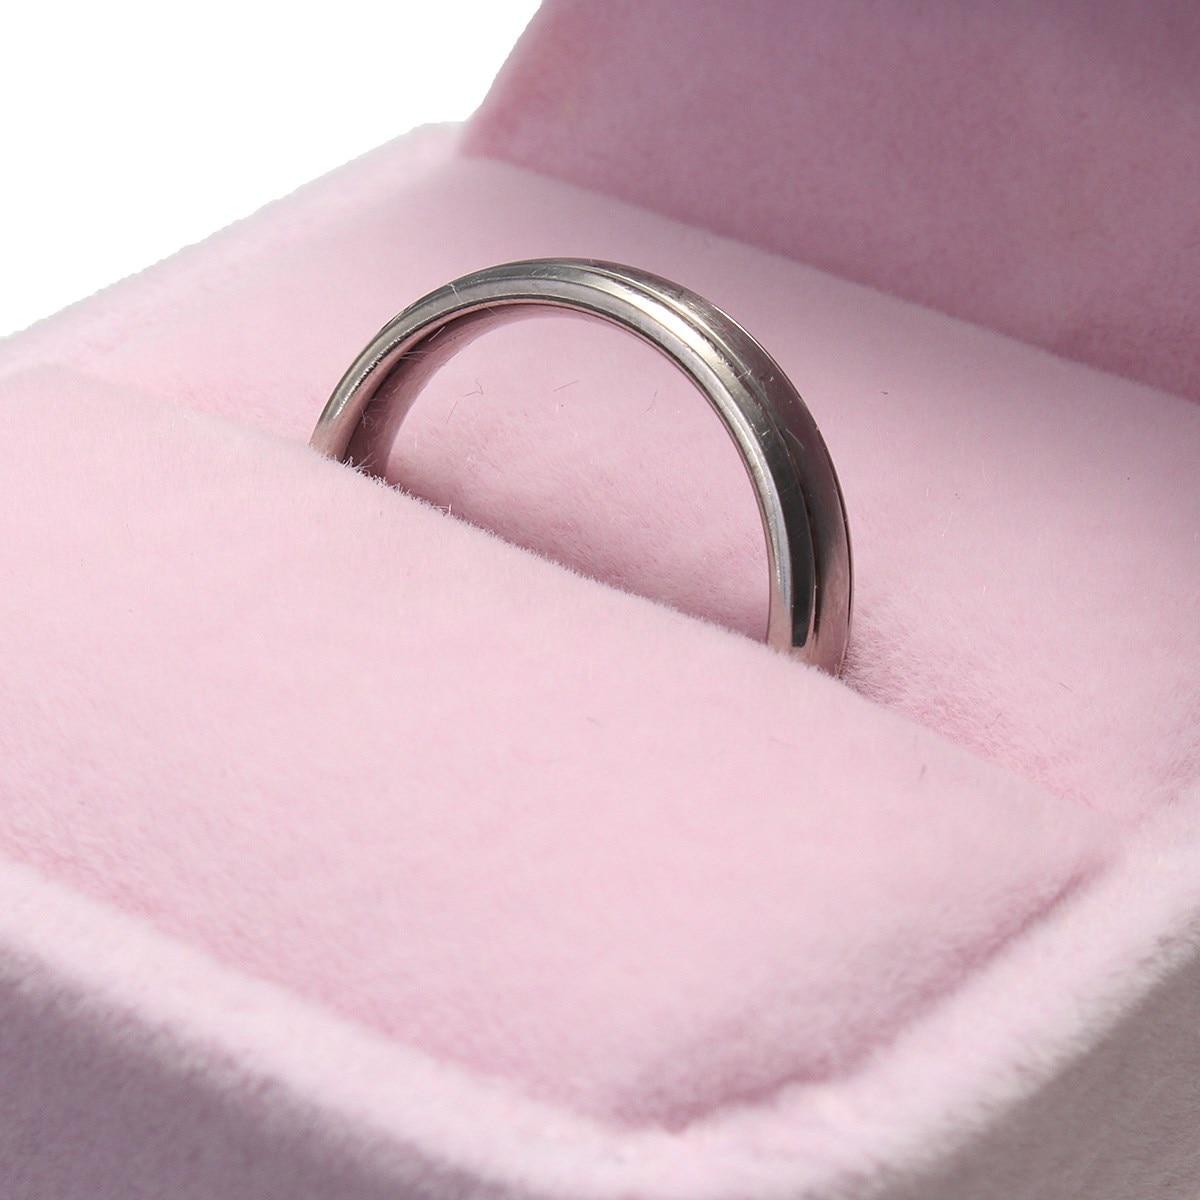 New Engagement Velvet Ring Box Jewelry Display & Packaging Storage ...